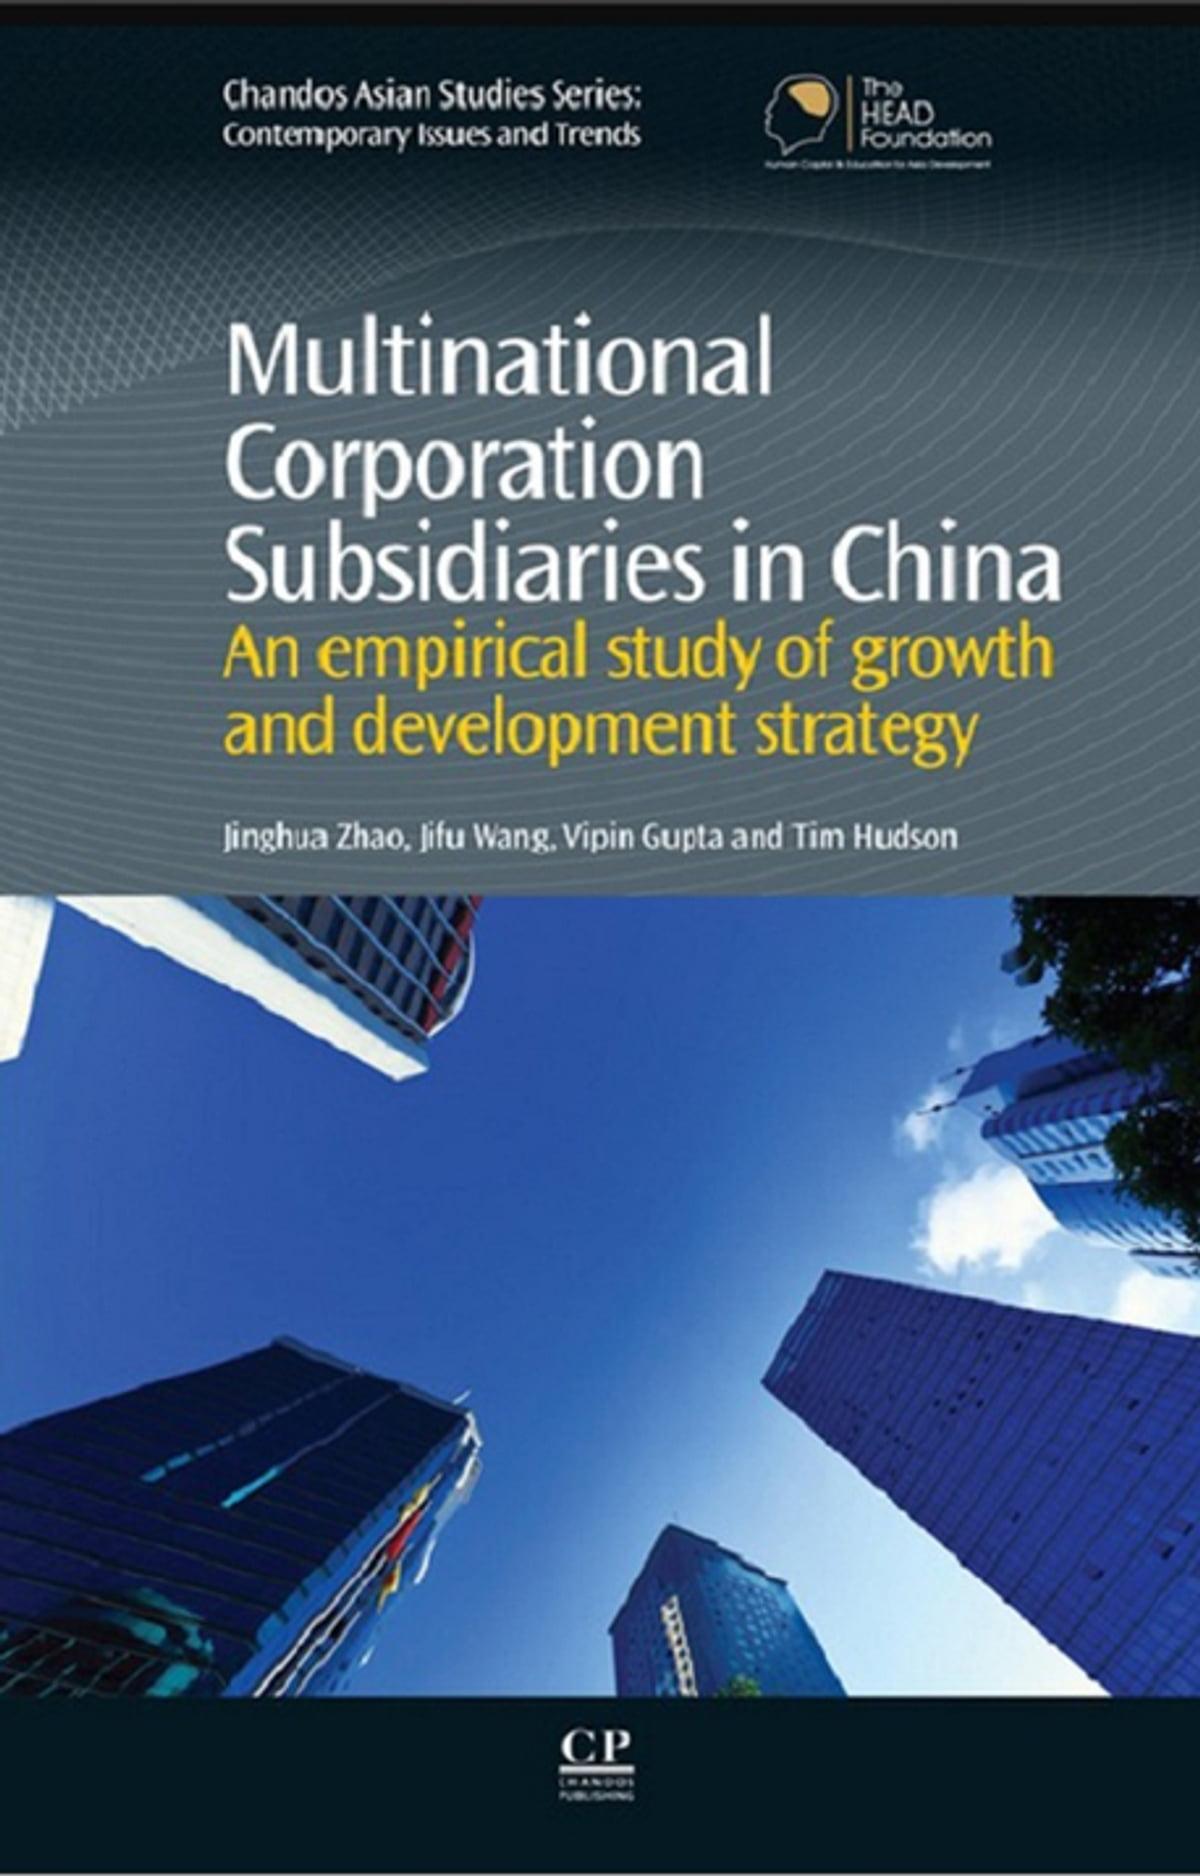 Multinational Corporation Subsidiaries in China eBook by Jinghua Zhao - 9781780633329 | Rakuten Kobo